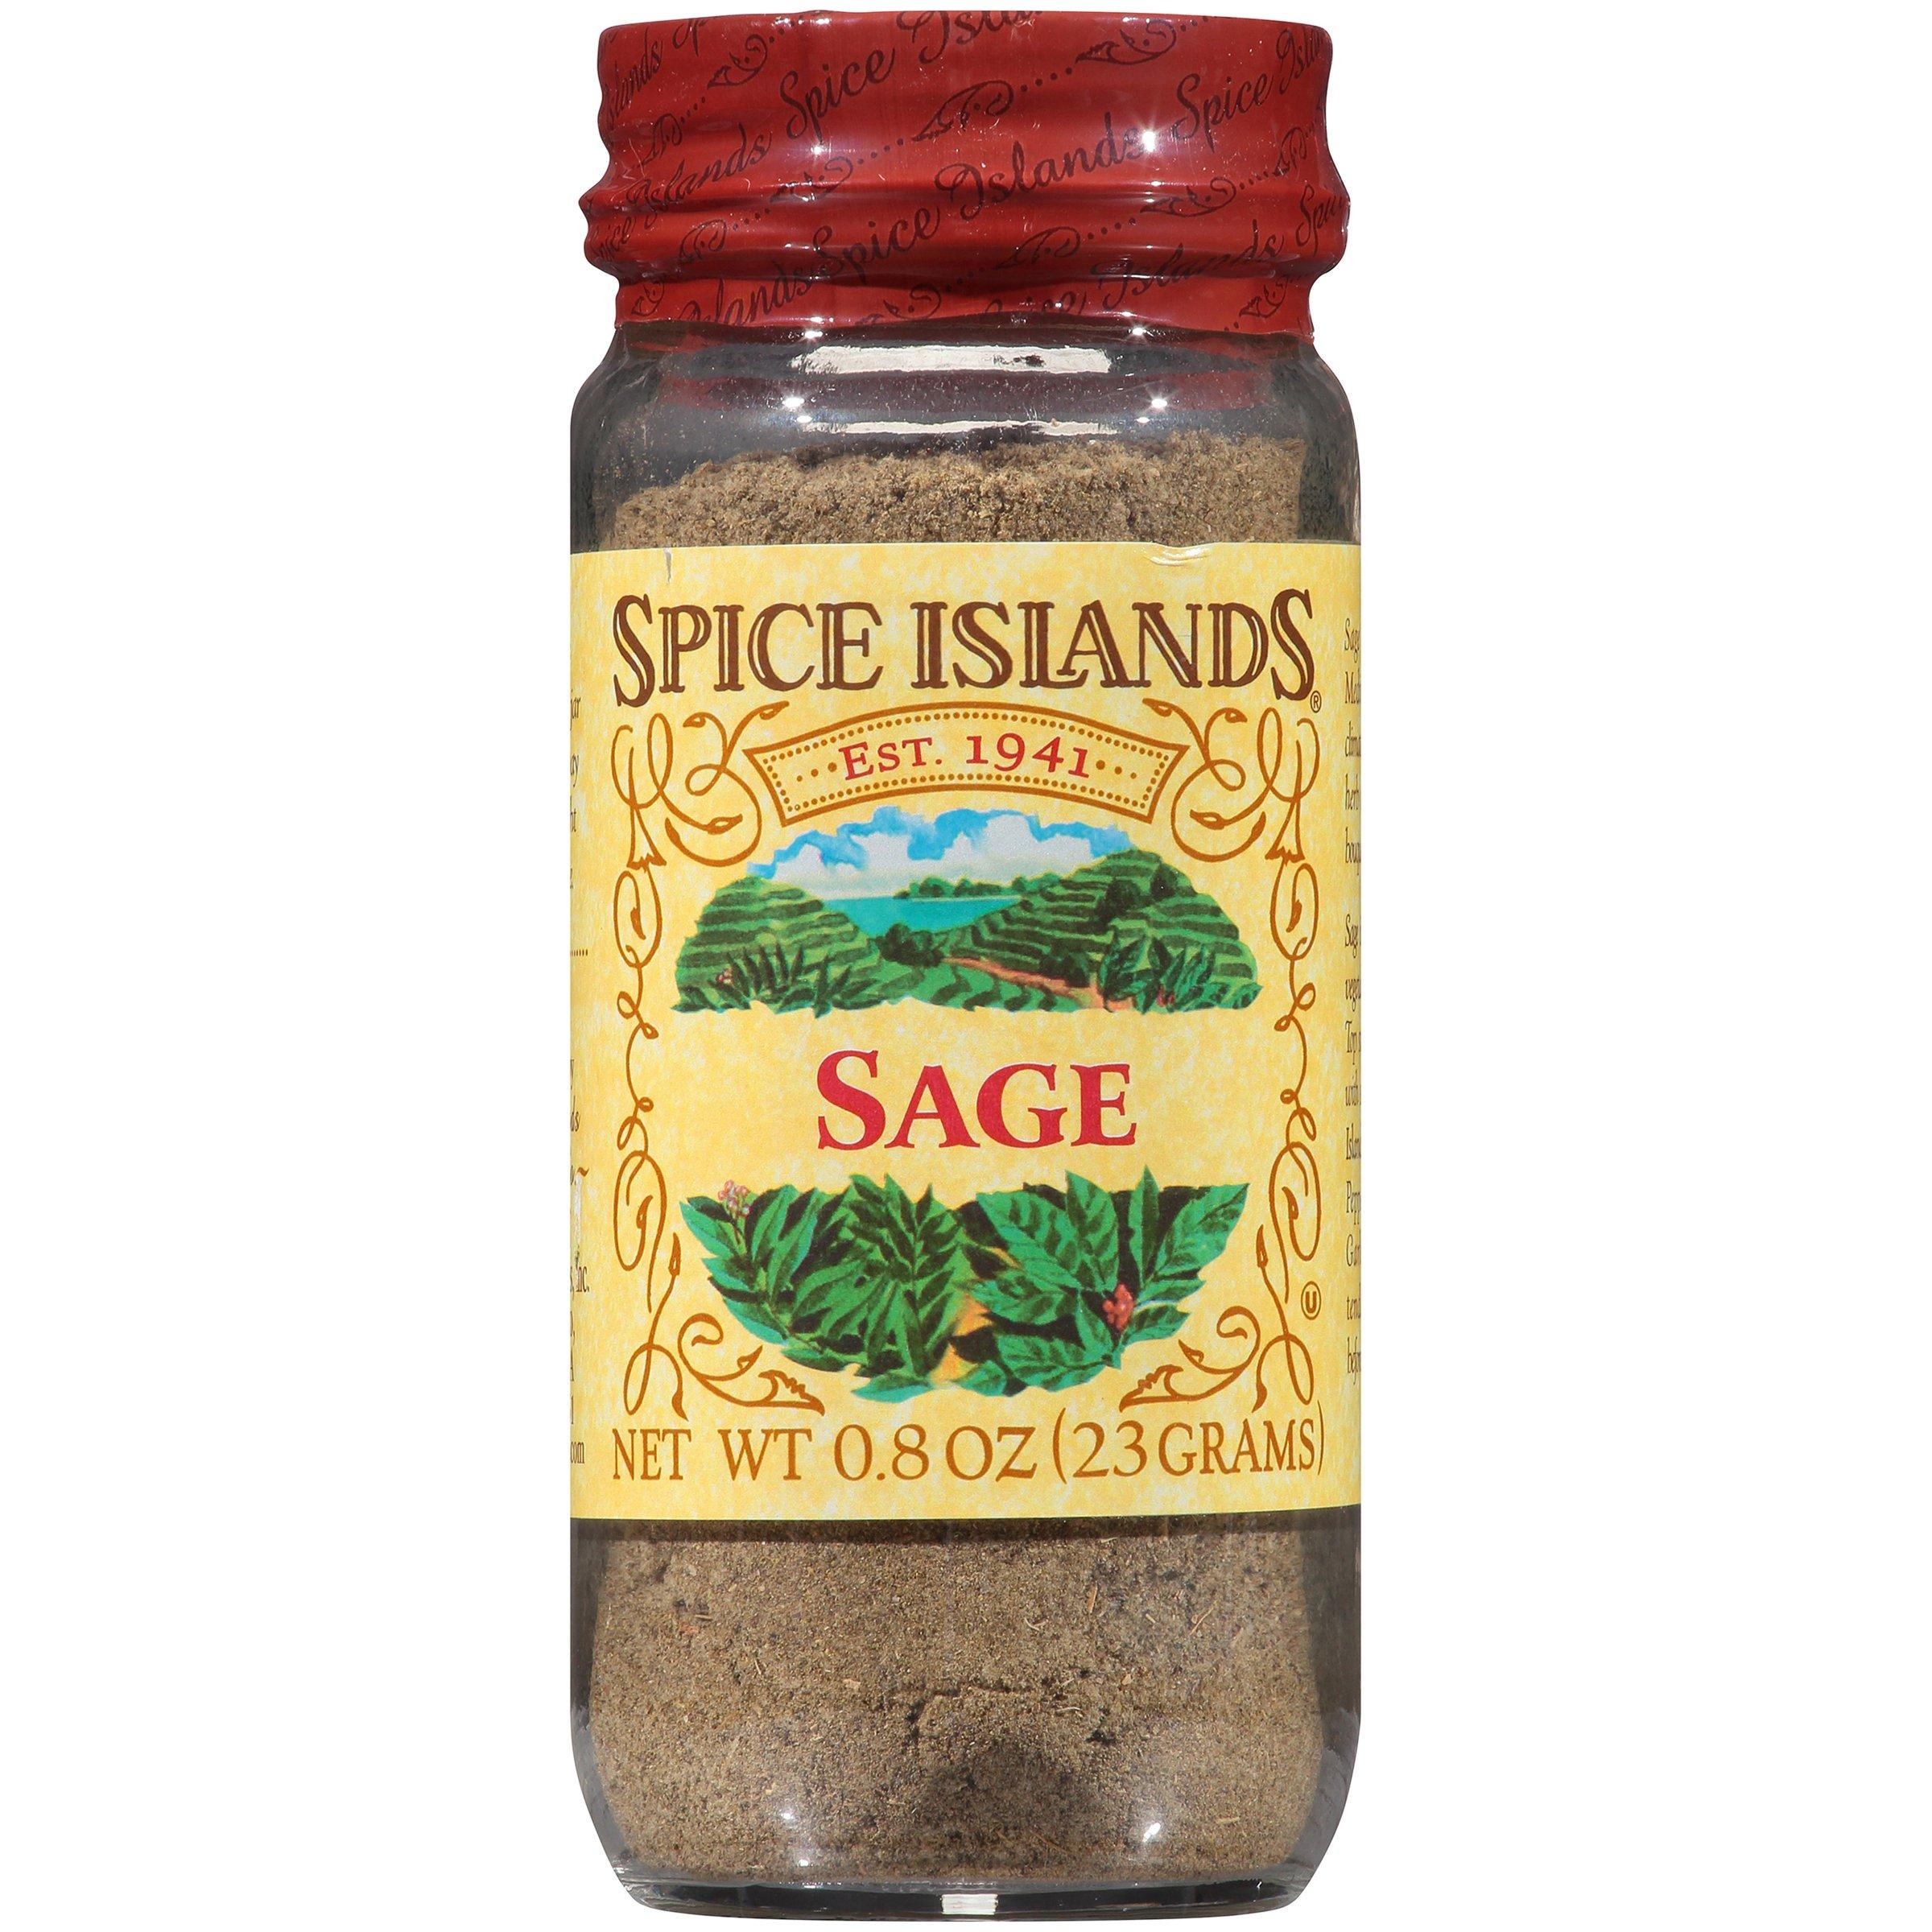 Spice Island Sage, 0.8-Ounce Jar (Pack of 4)